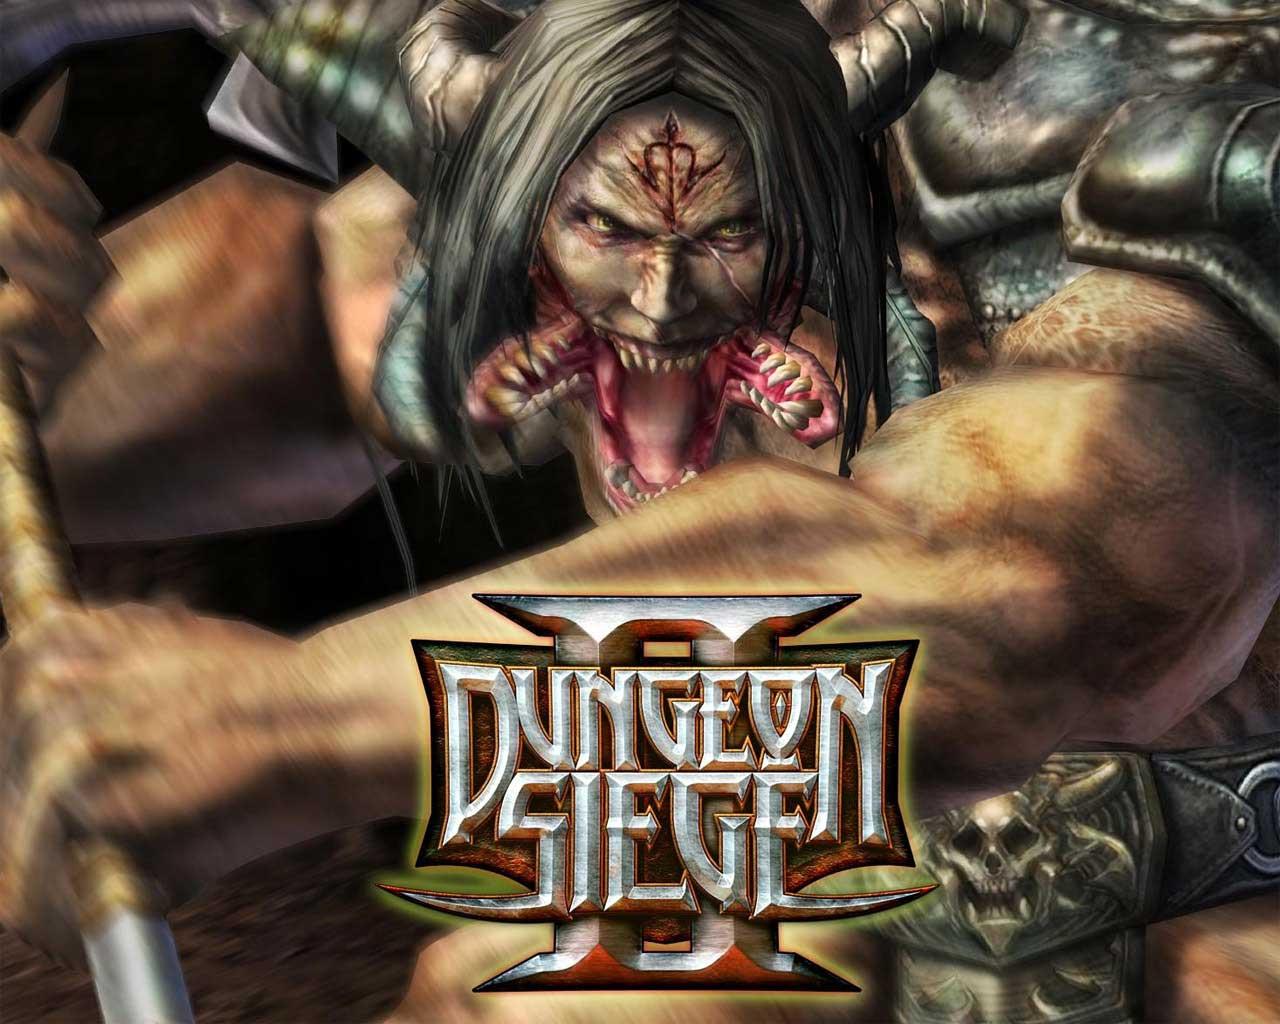 http://3.bp.blogspot.com/-cjOfTfR8rUA/TiKOcrjp6oI/AAAAAAAABnc/meAKZKCyxOE/s1600/Dungeon+Siege+2.jpg